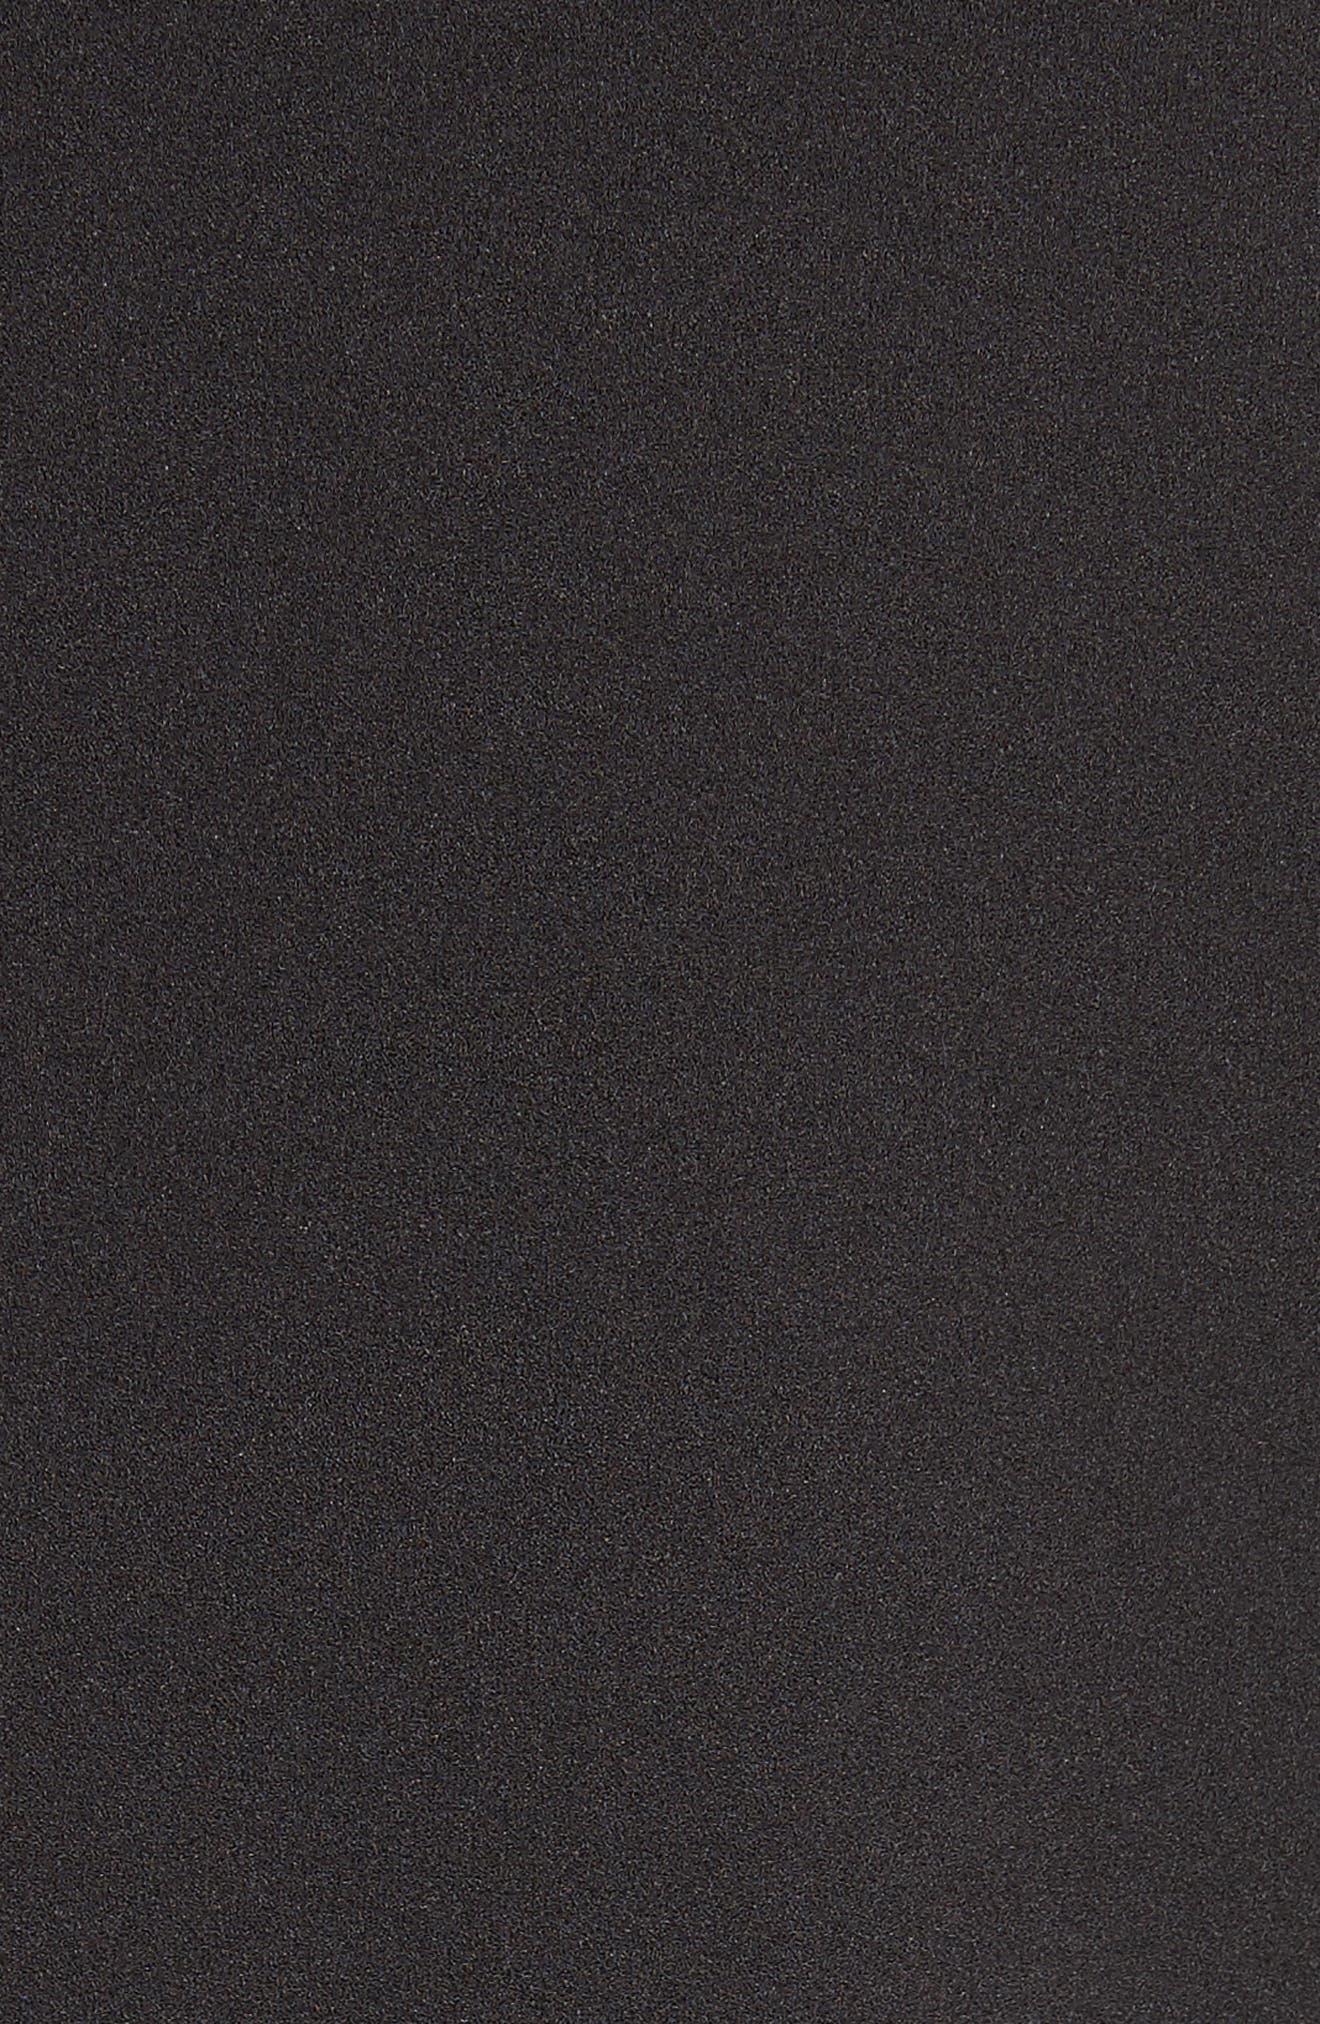 Crepe Balloon Sleeve Dress,                             Alternate thumbnail 5, color,                             Black